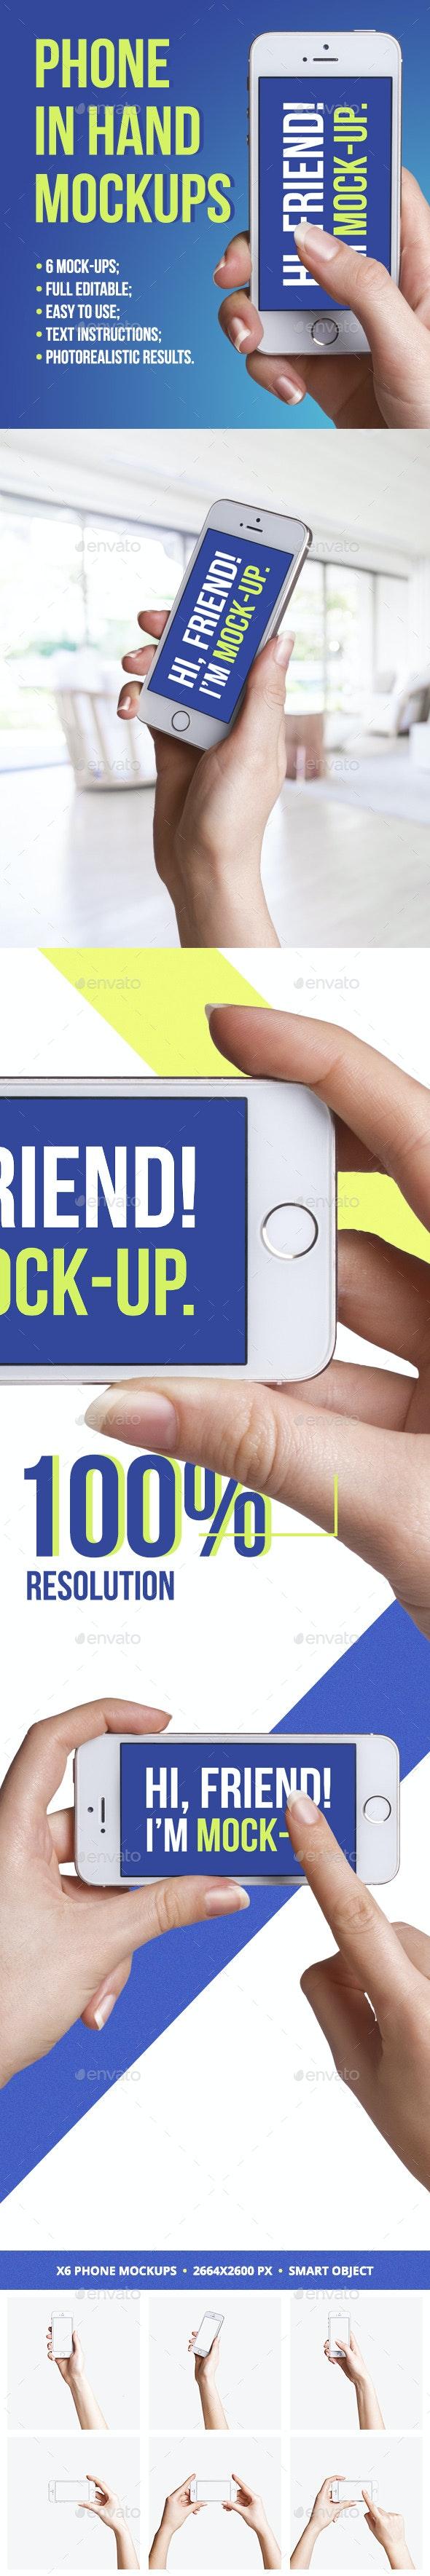 Phone In Hand Mockups - Mobile Displays